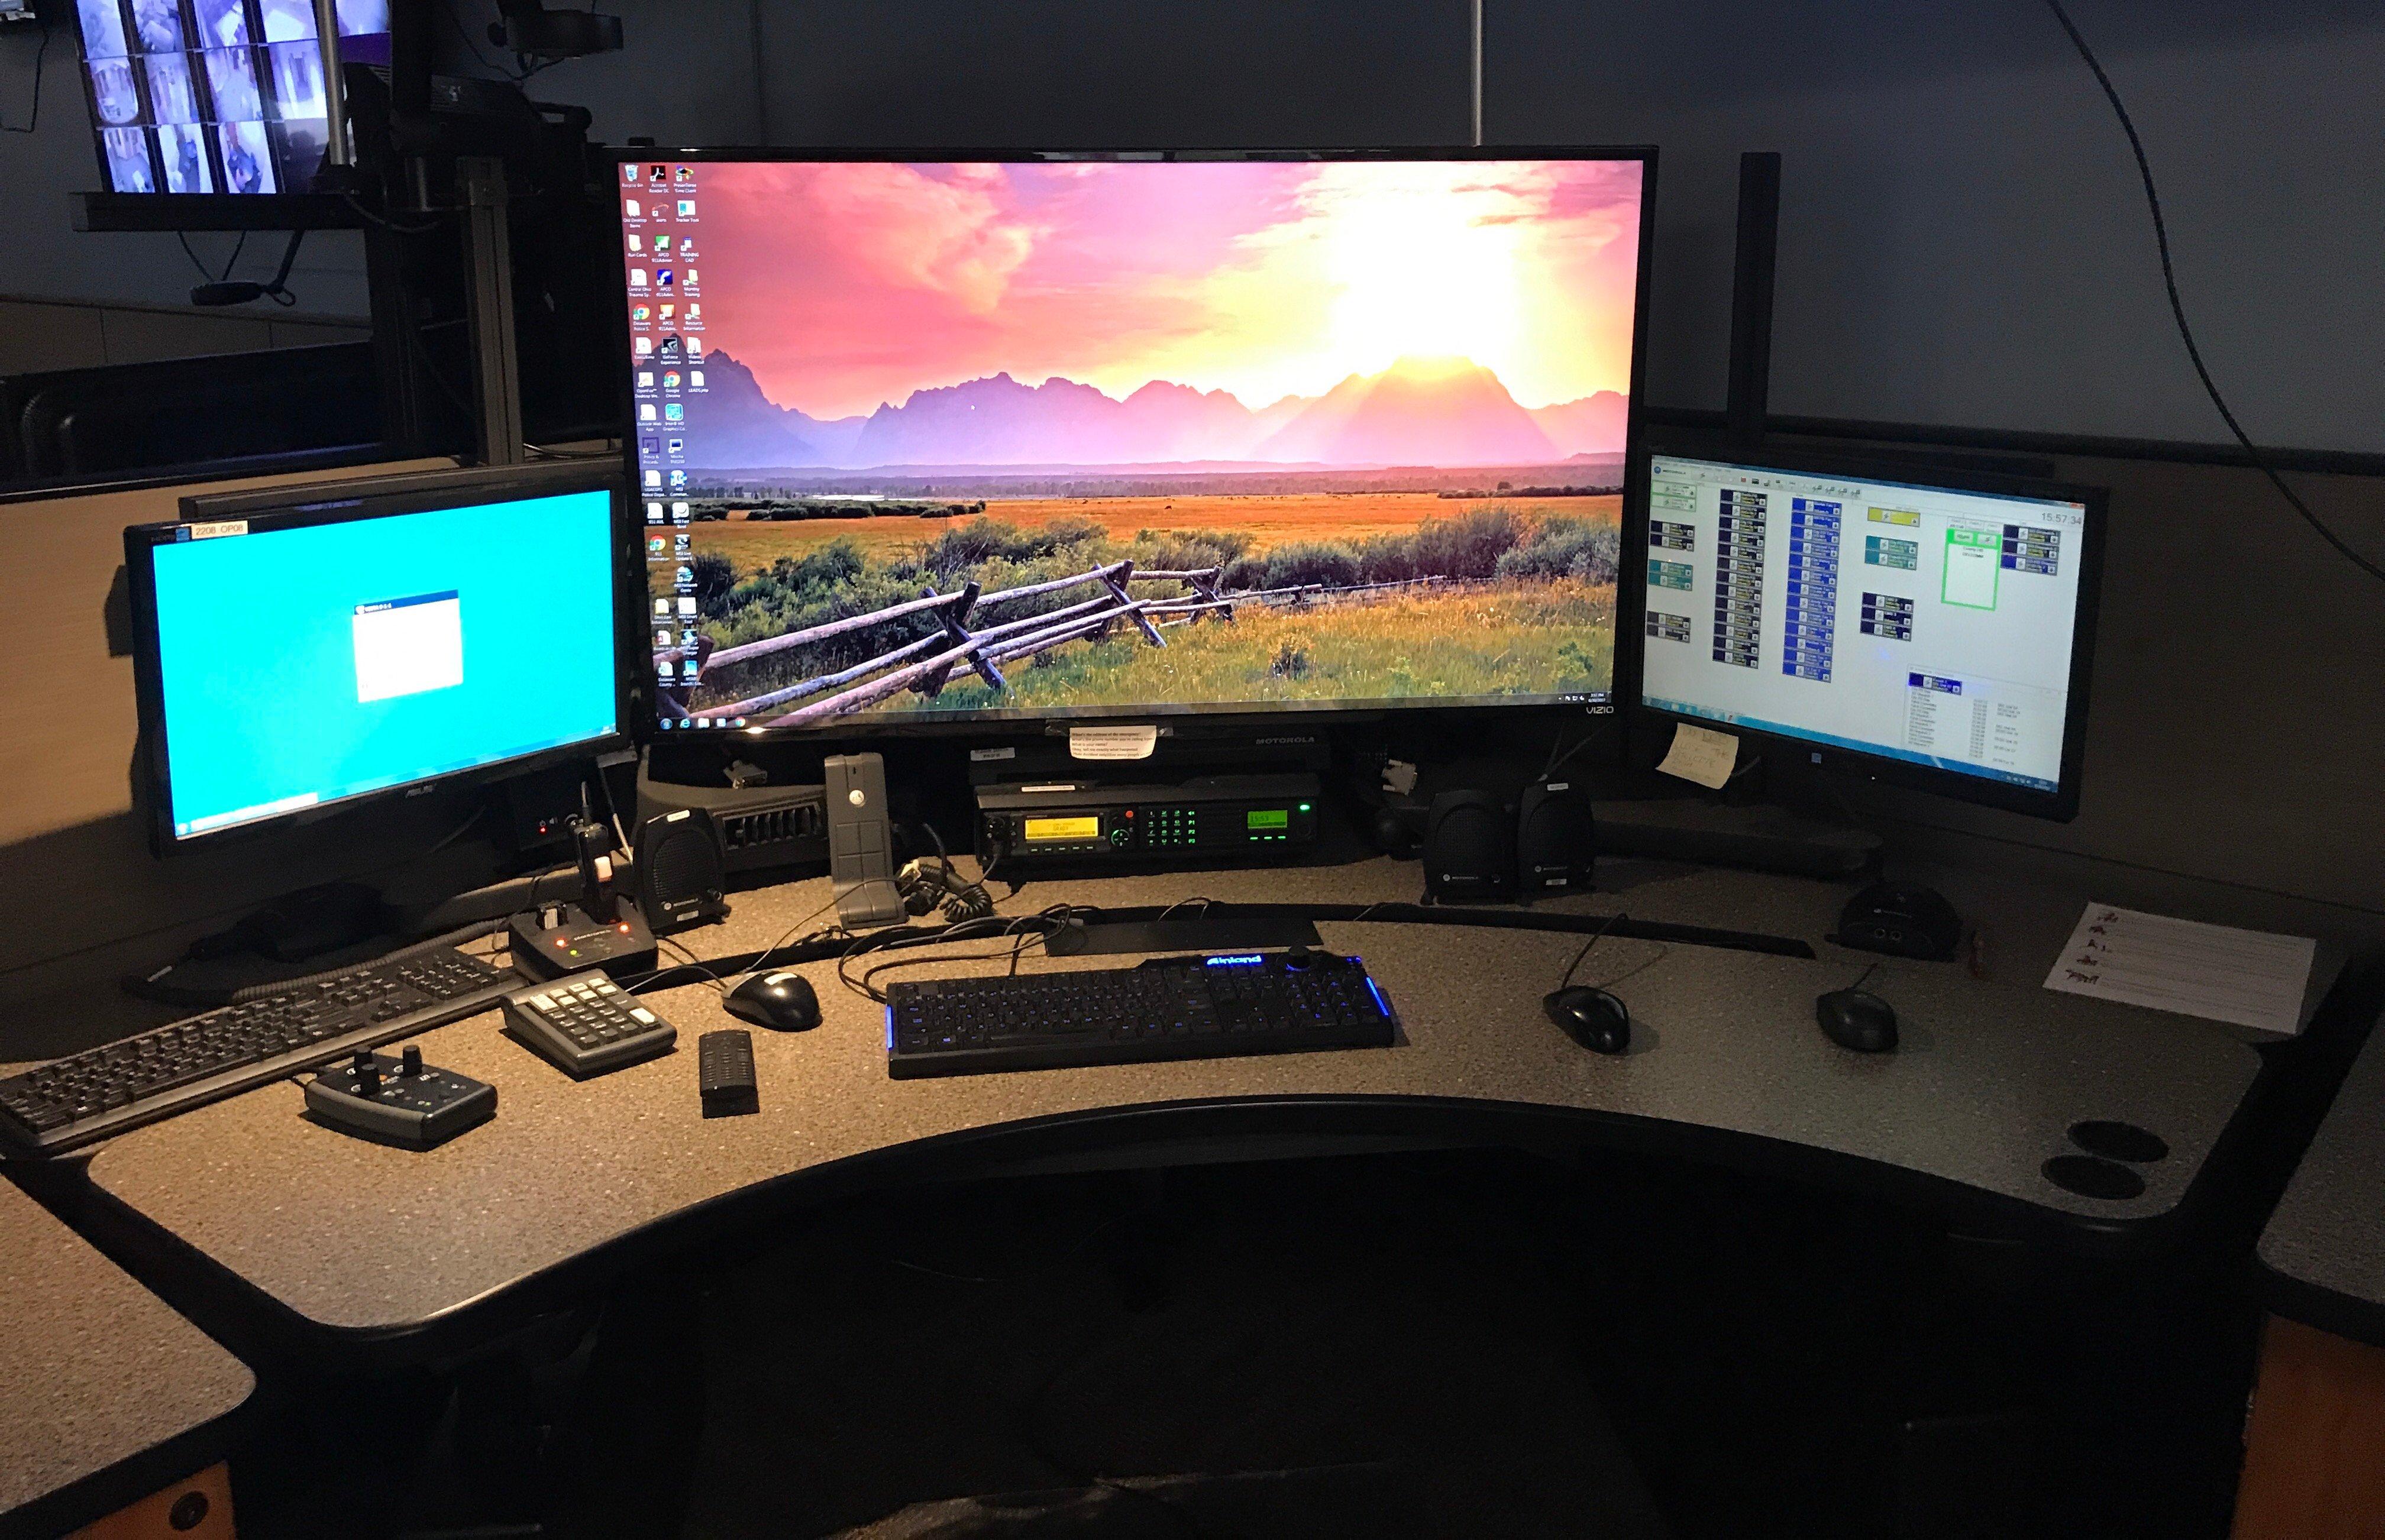 Xybix Larger Monitor Mount for National Ergonomic Standards